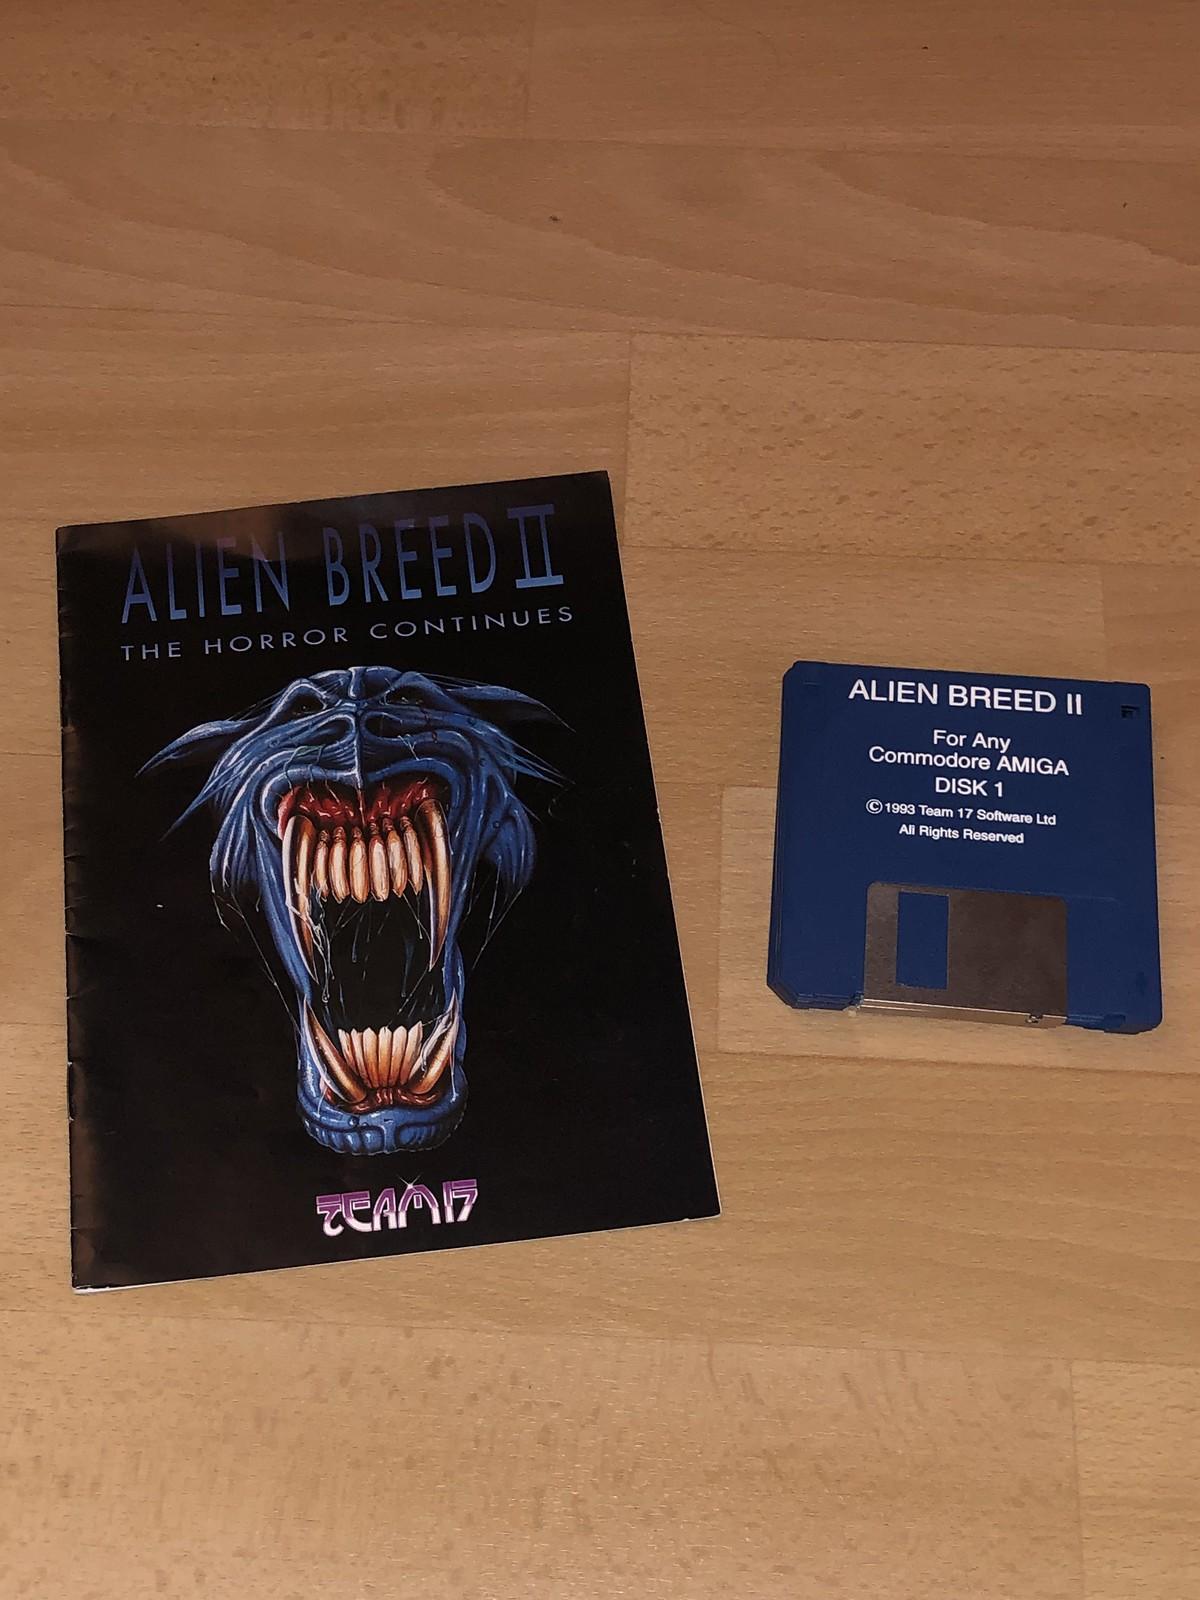 [VDS] Jeux Amiga, X68000, Atari, magazines 50378103992_abb066e612_h